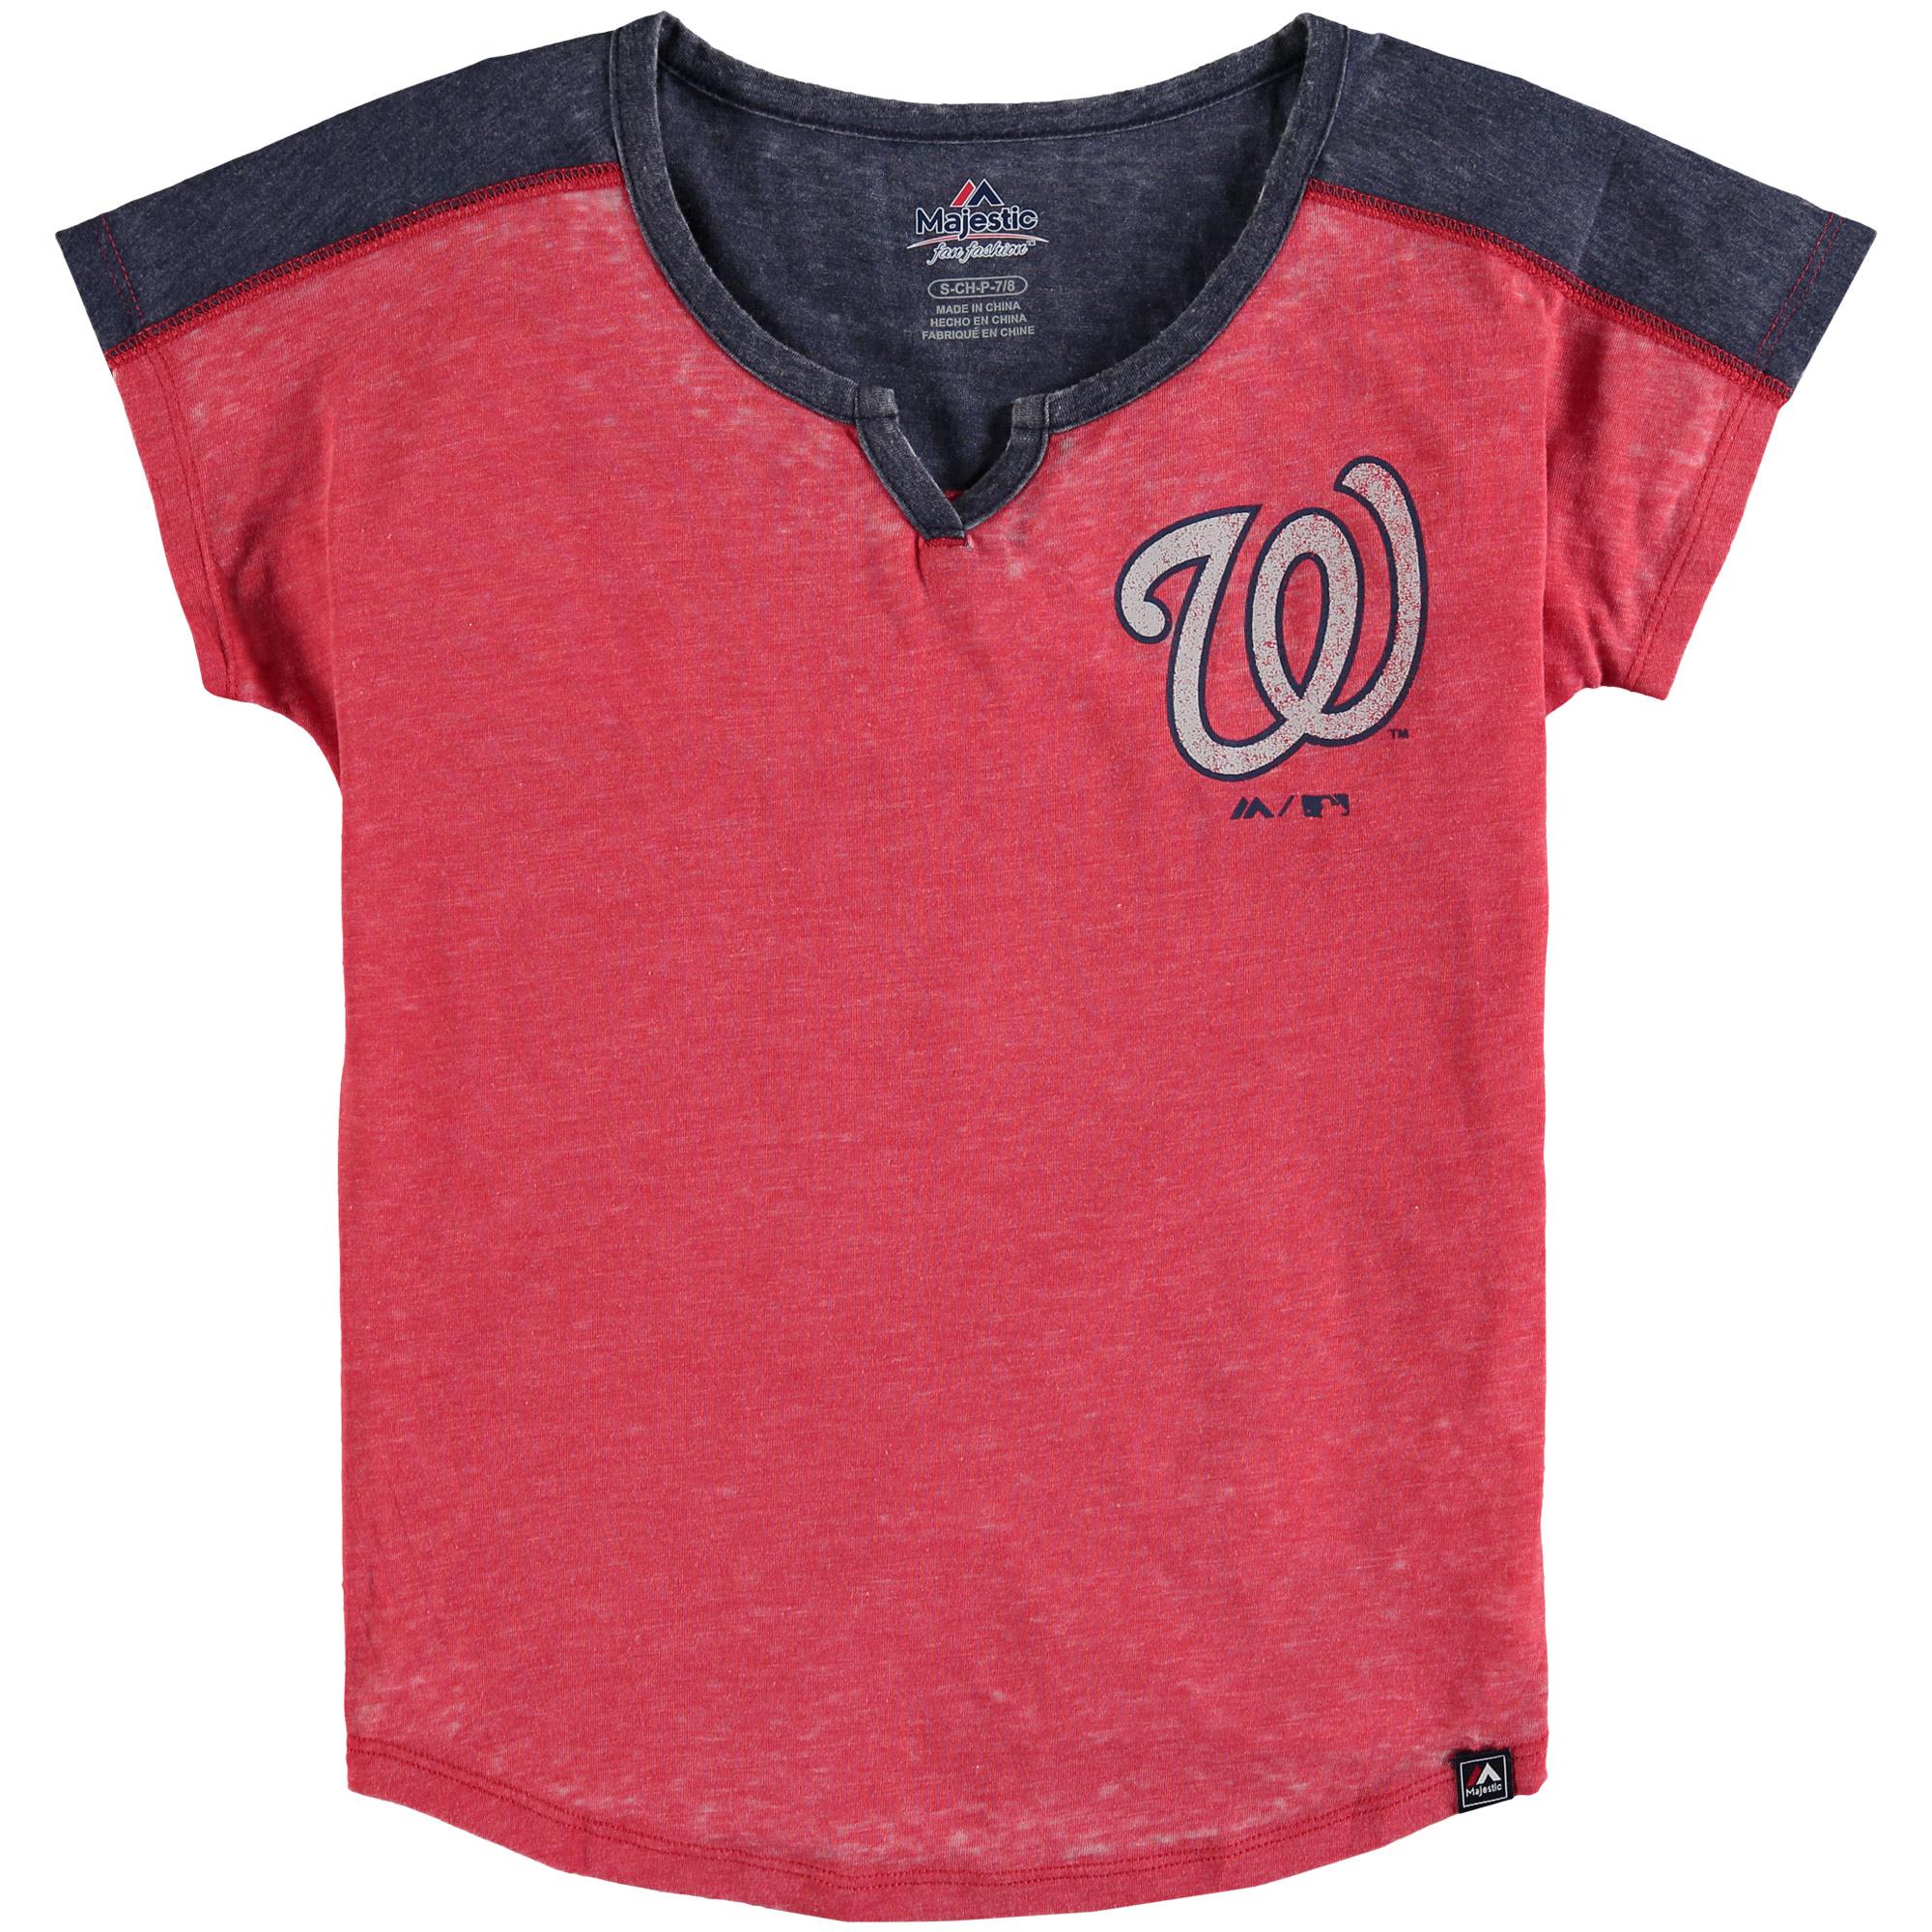 Washington Nationals Majestic Girls Youth Ballpark Best Color Block Dolman Sleeve T-Shirt - Red/Navy